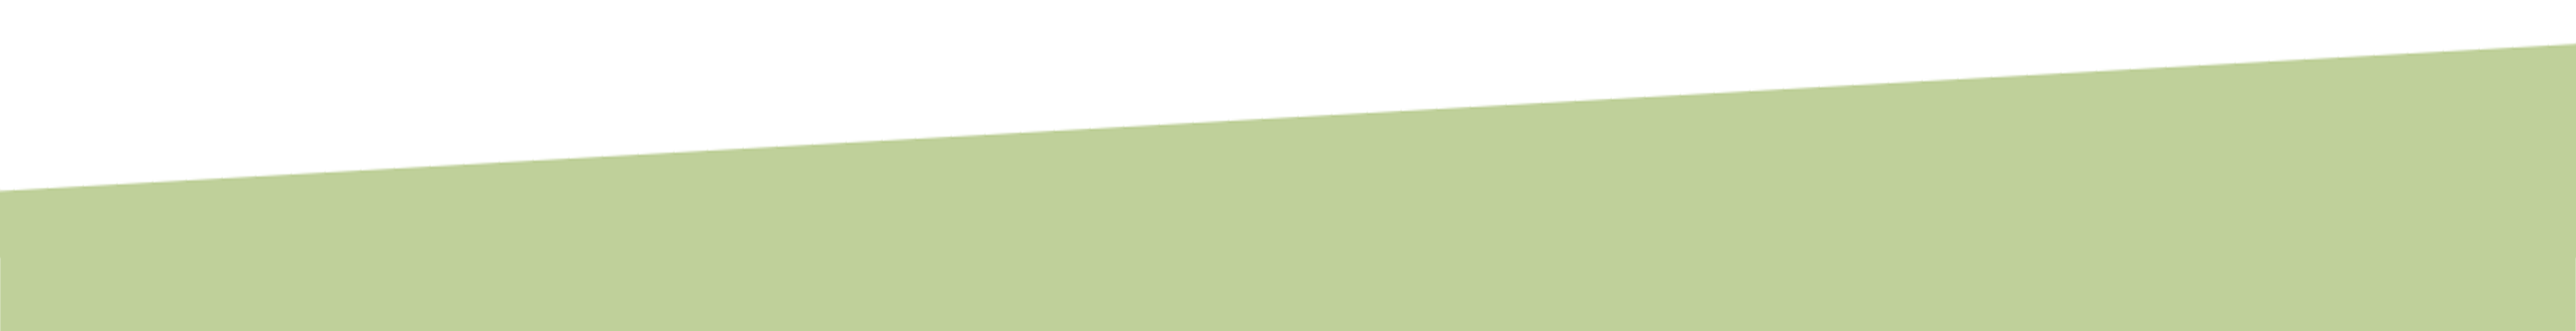 Footer Background - Hidden River Townhomes - Kirkland, WA 98034